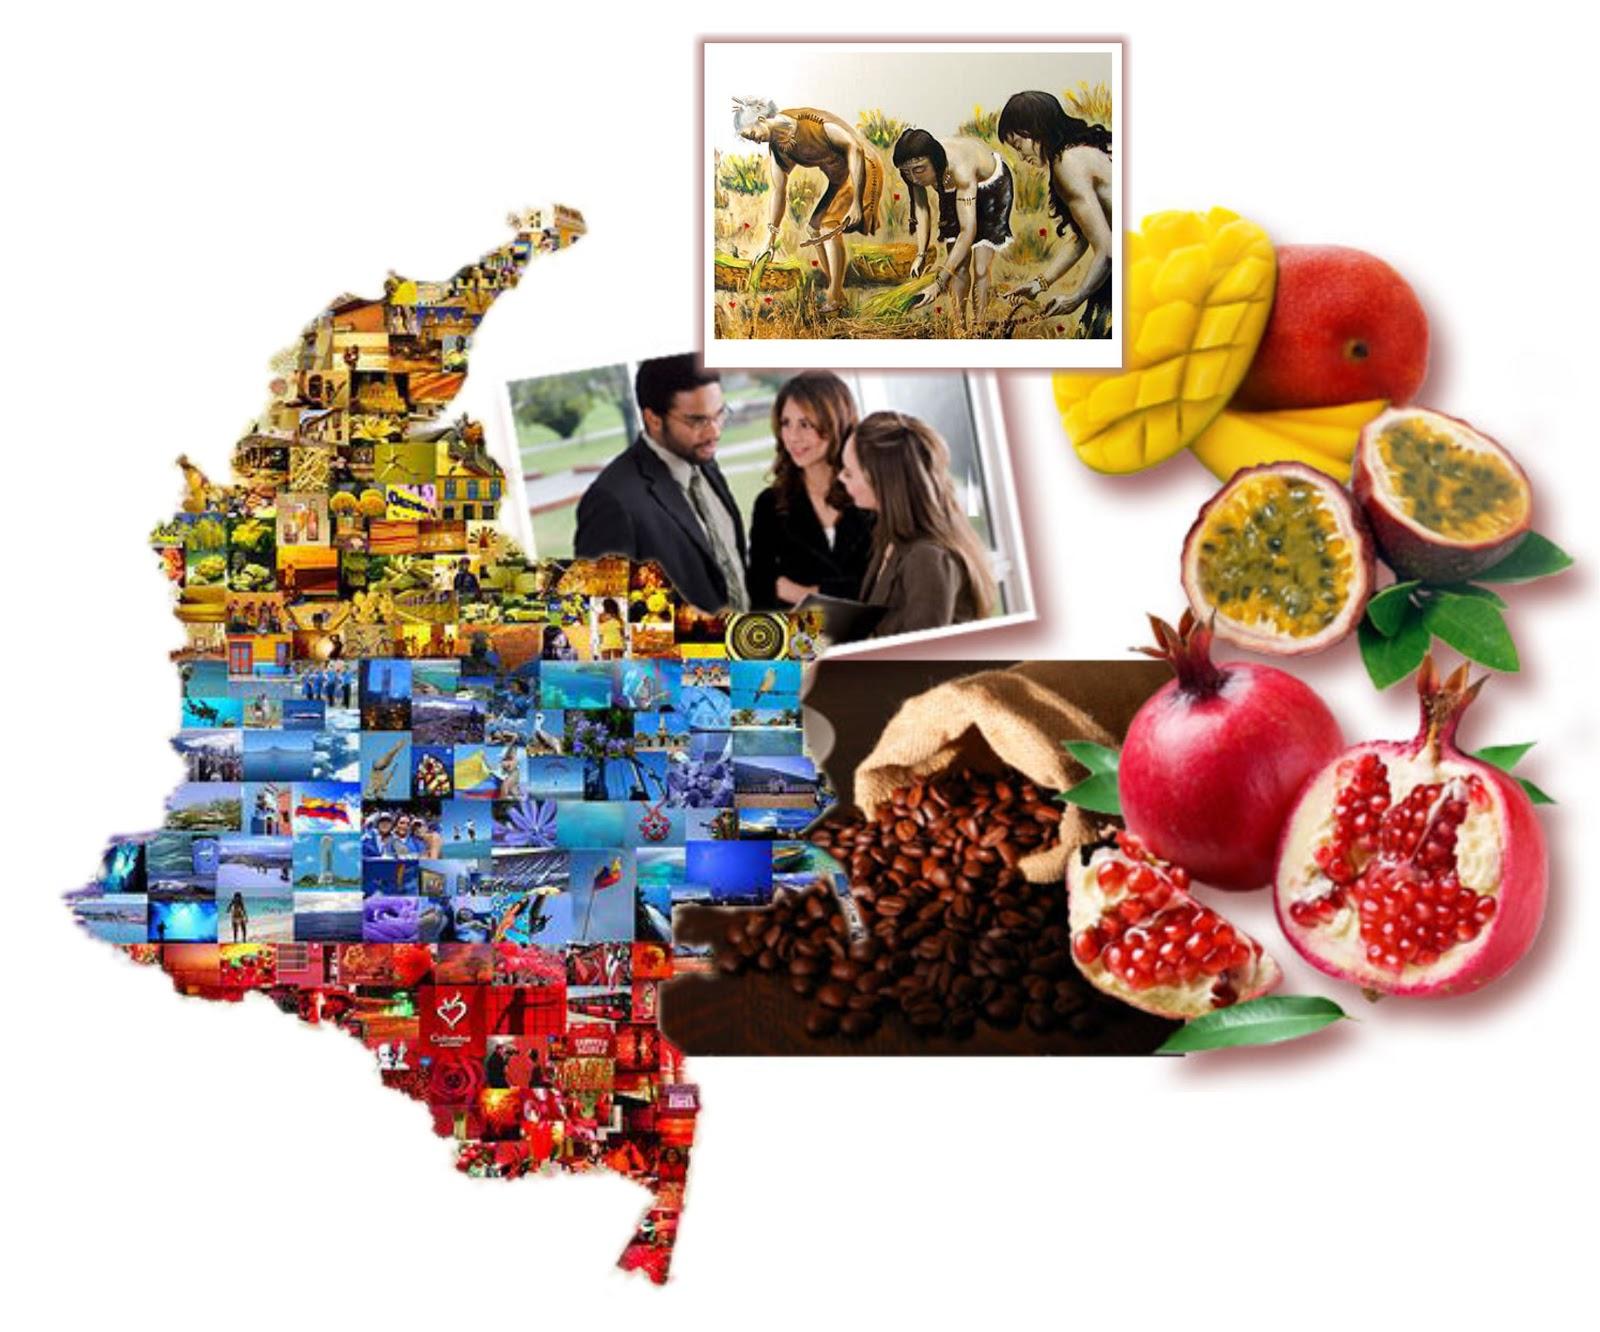 Instituciones de comercio mundial instituciones locales for Comercio exterior que es